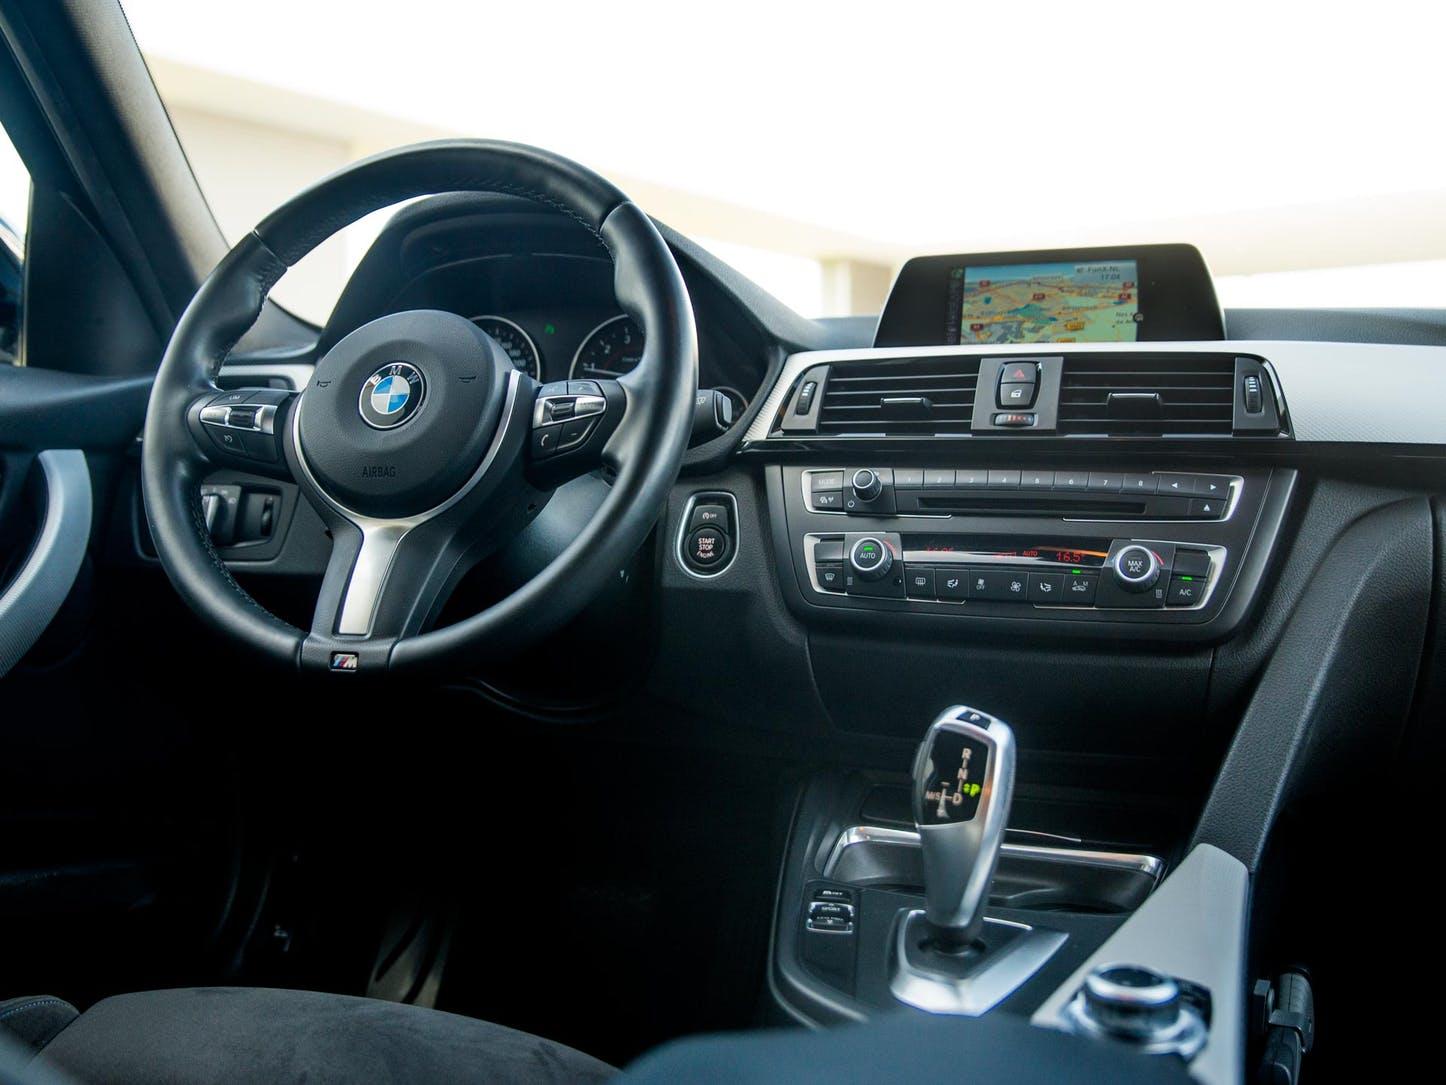 Tweedehands BMW 3 Serie 316i occasion